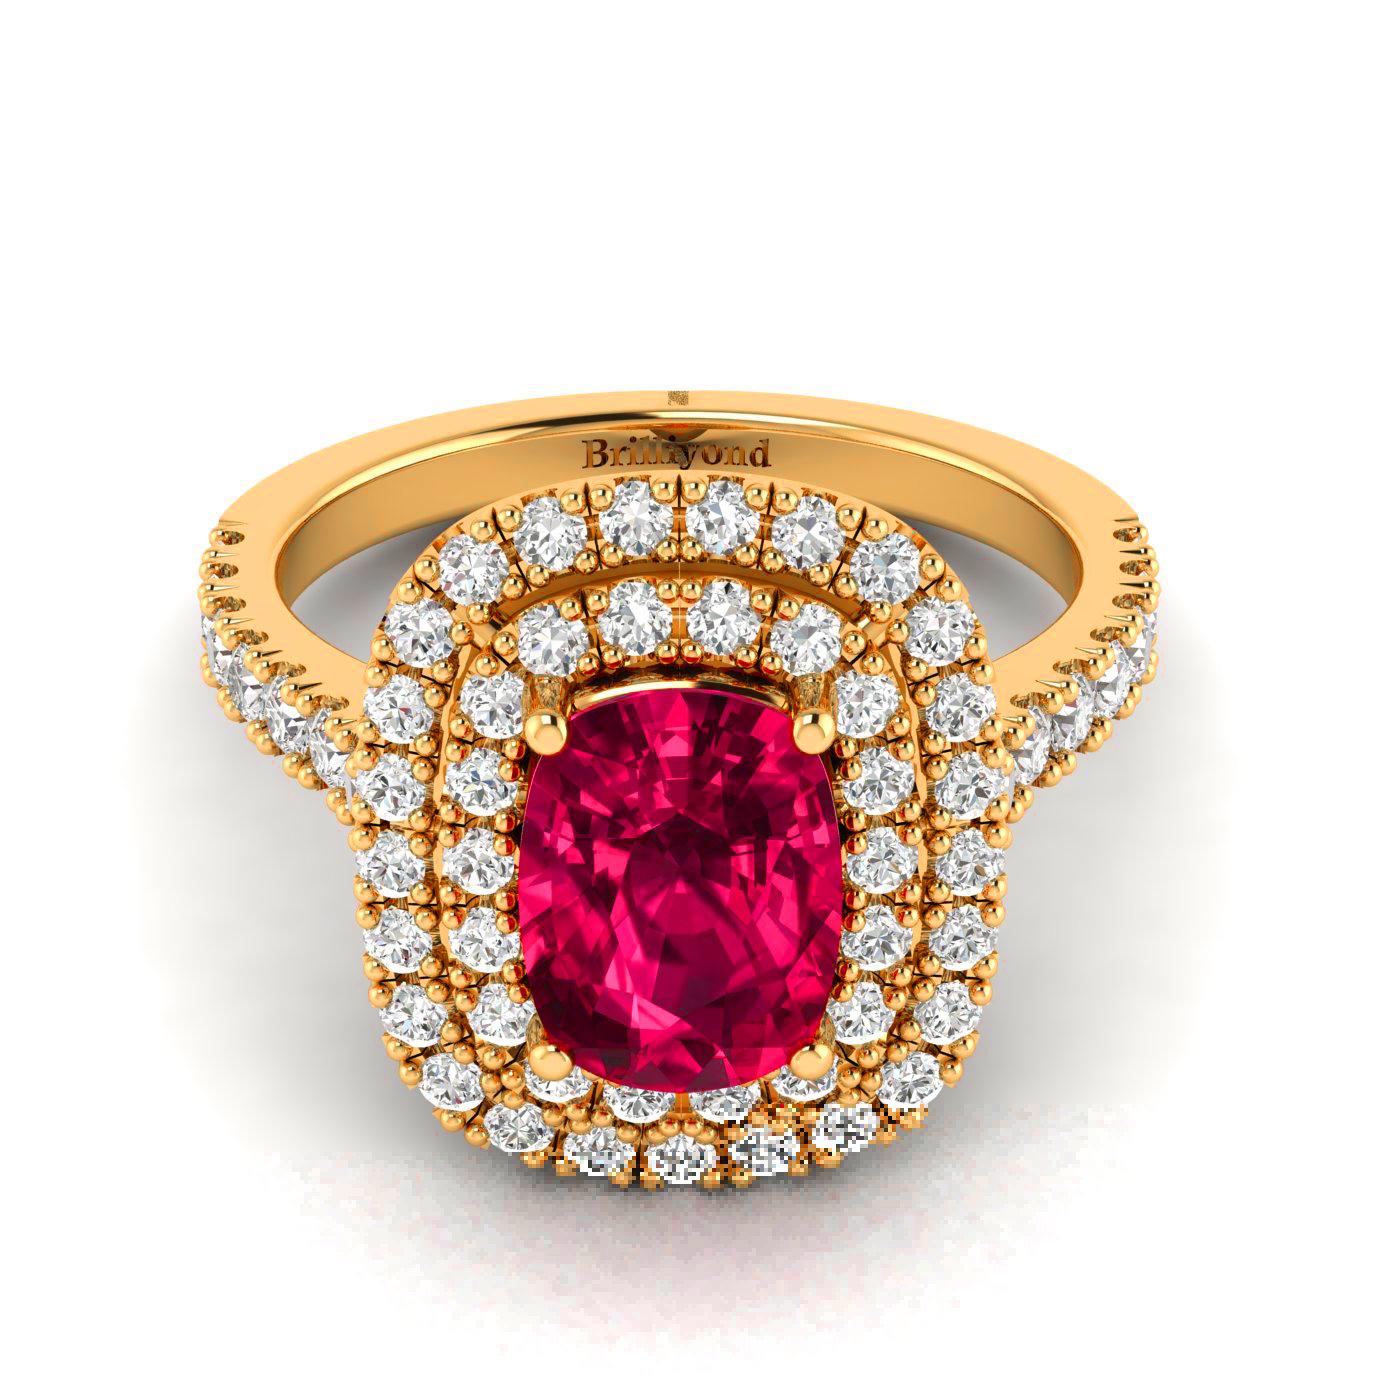 Cushion Cut Ruby Engagement Ring by Brilliyond Australia